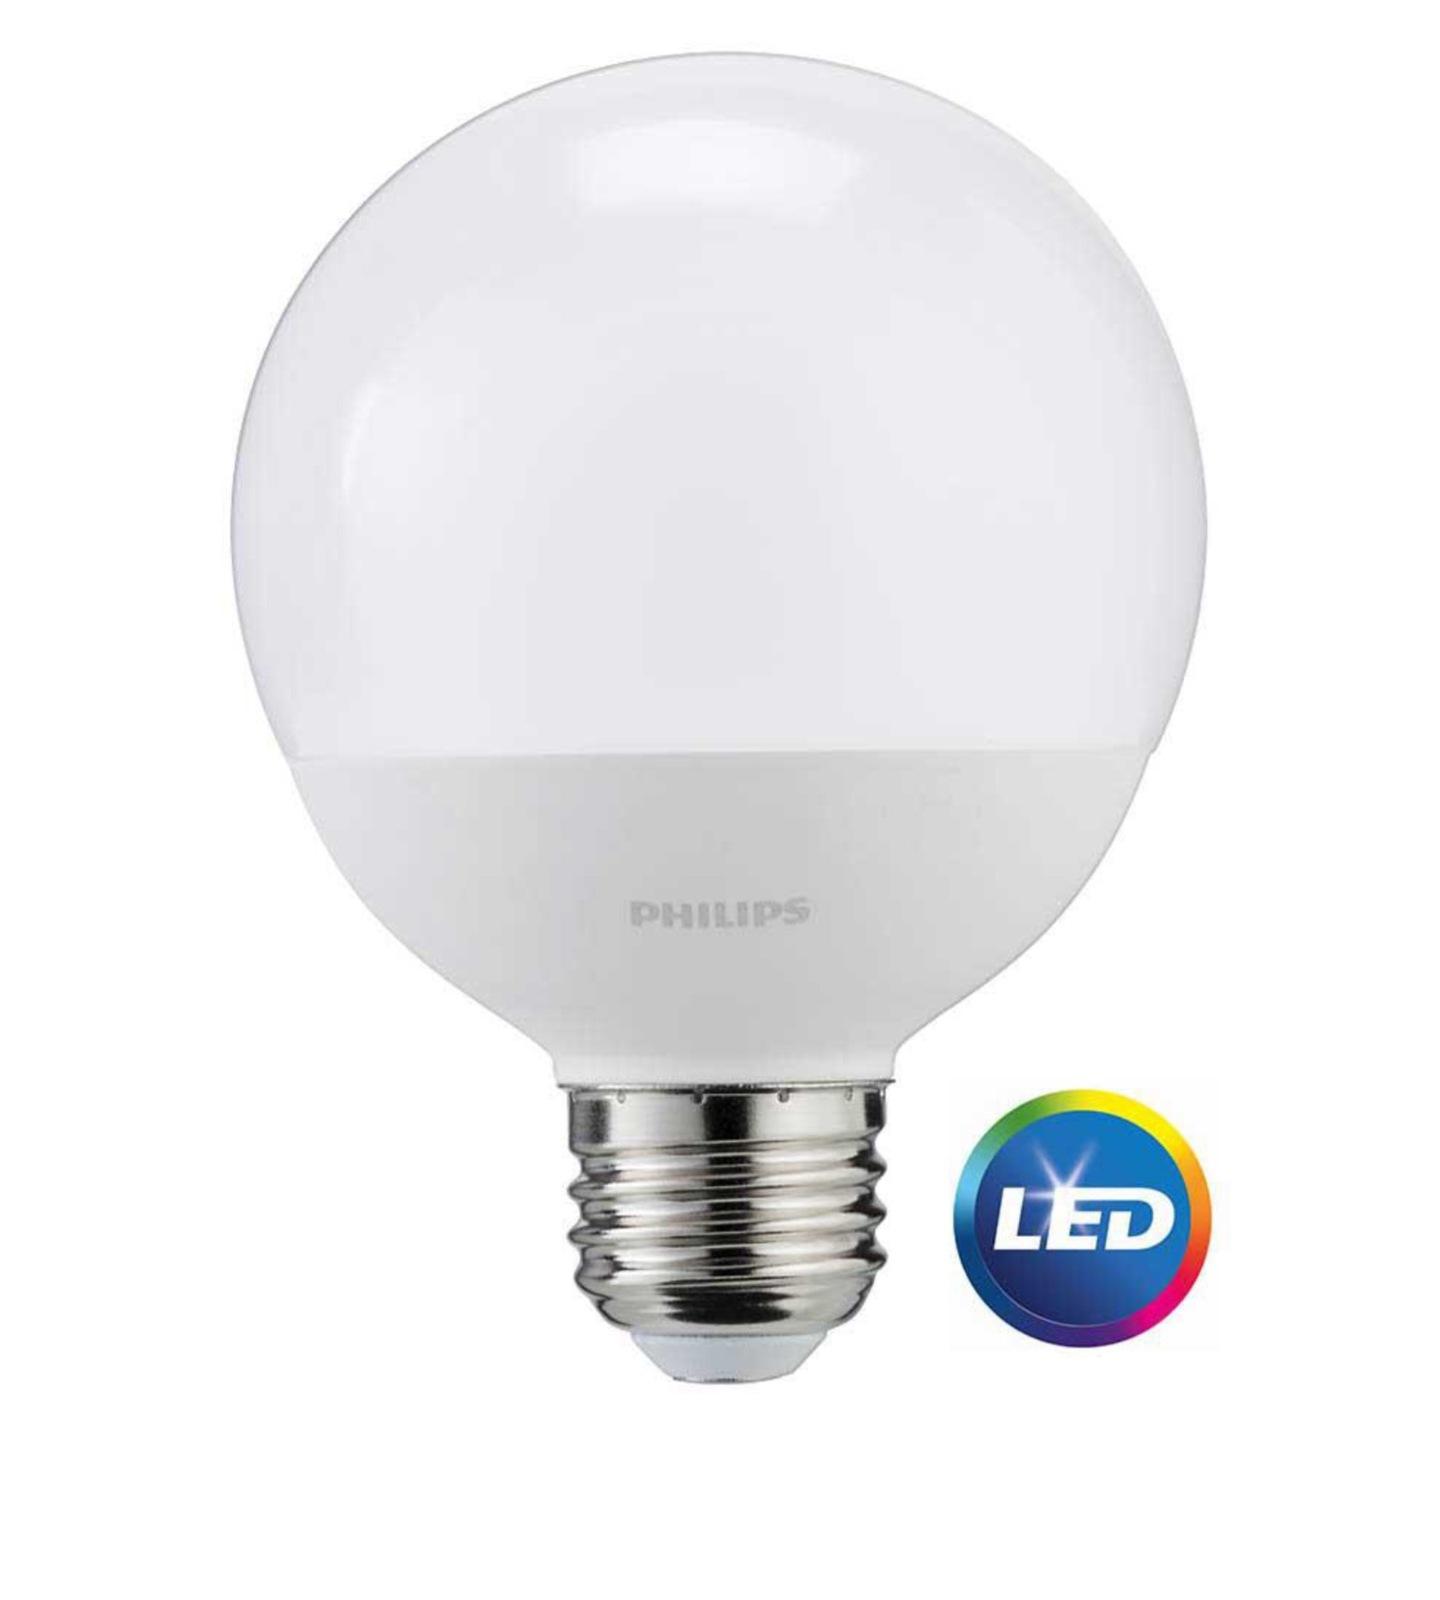 3 Bulbs Philips 60w Equivalent Daylight Frosted G25 Globe Led Light Bulb Light Bulbs